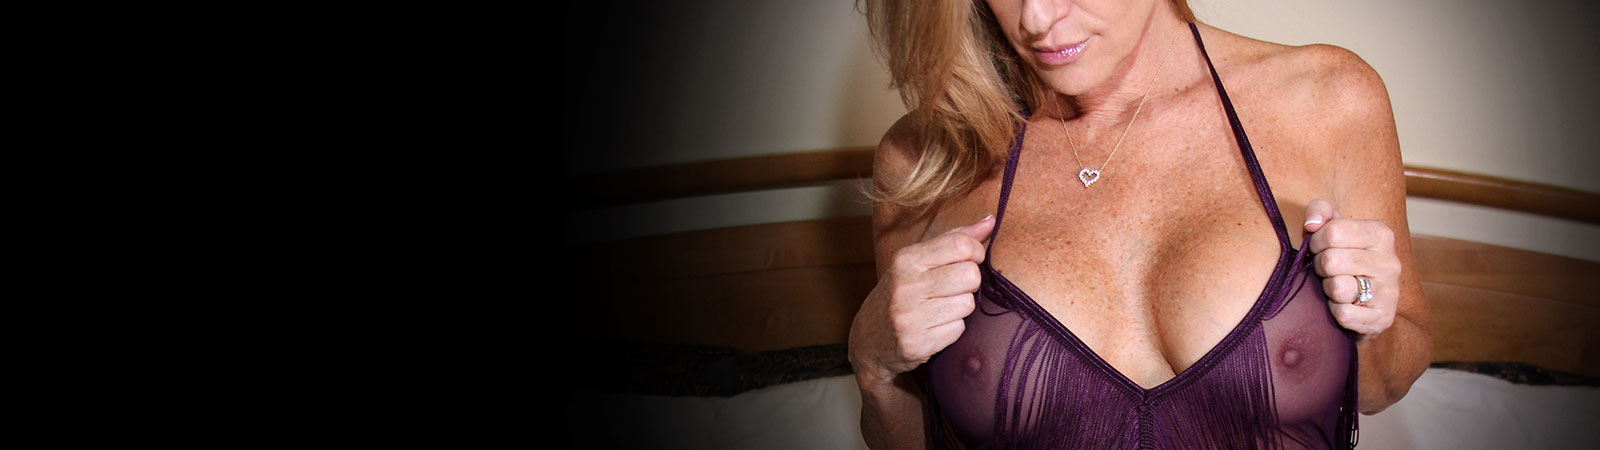 Jodi West Free Cams Image